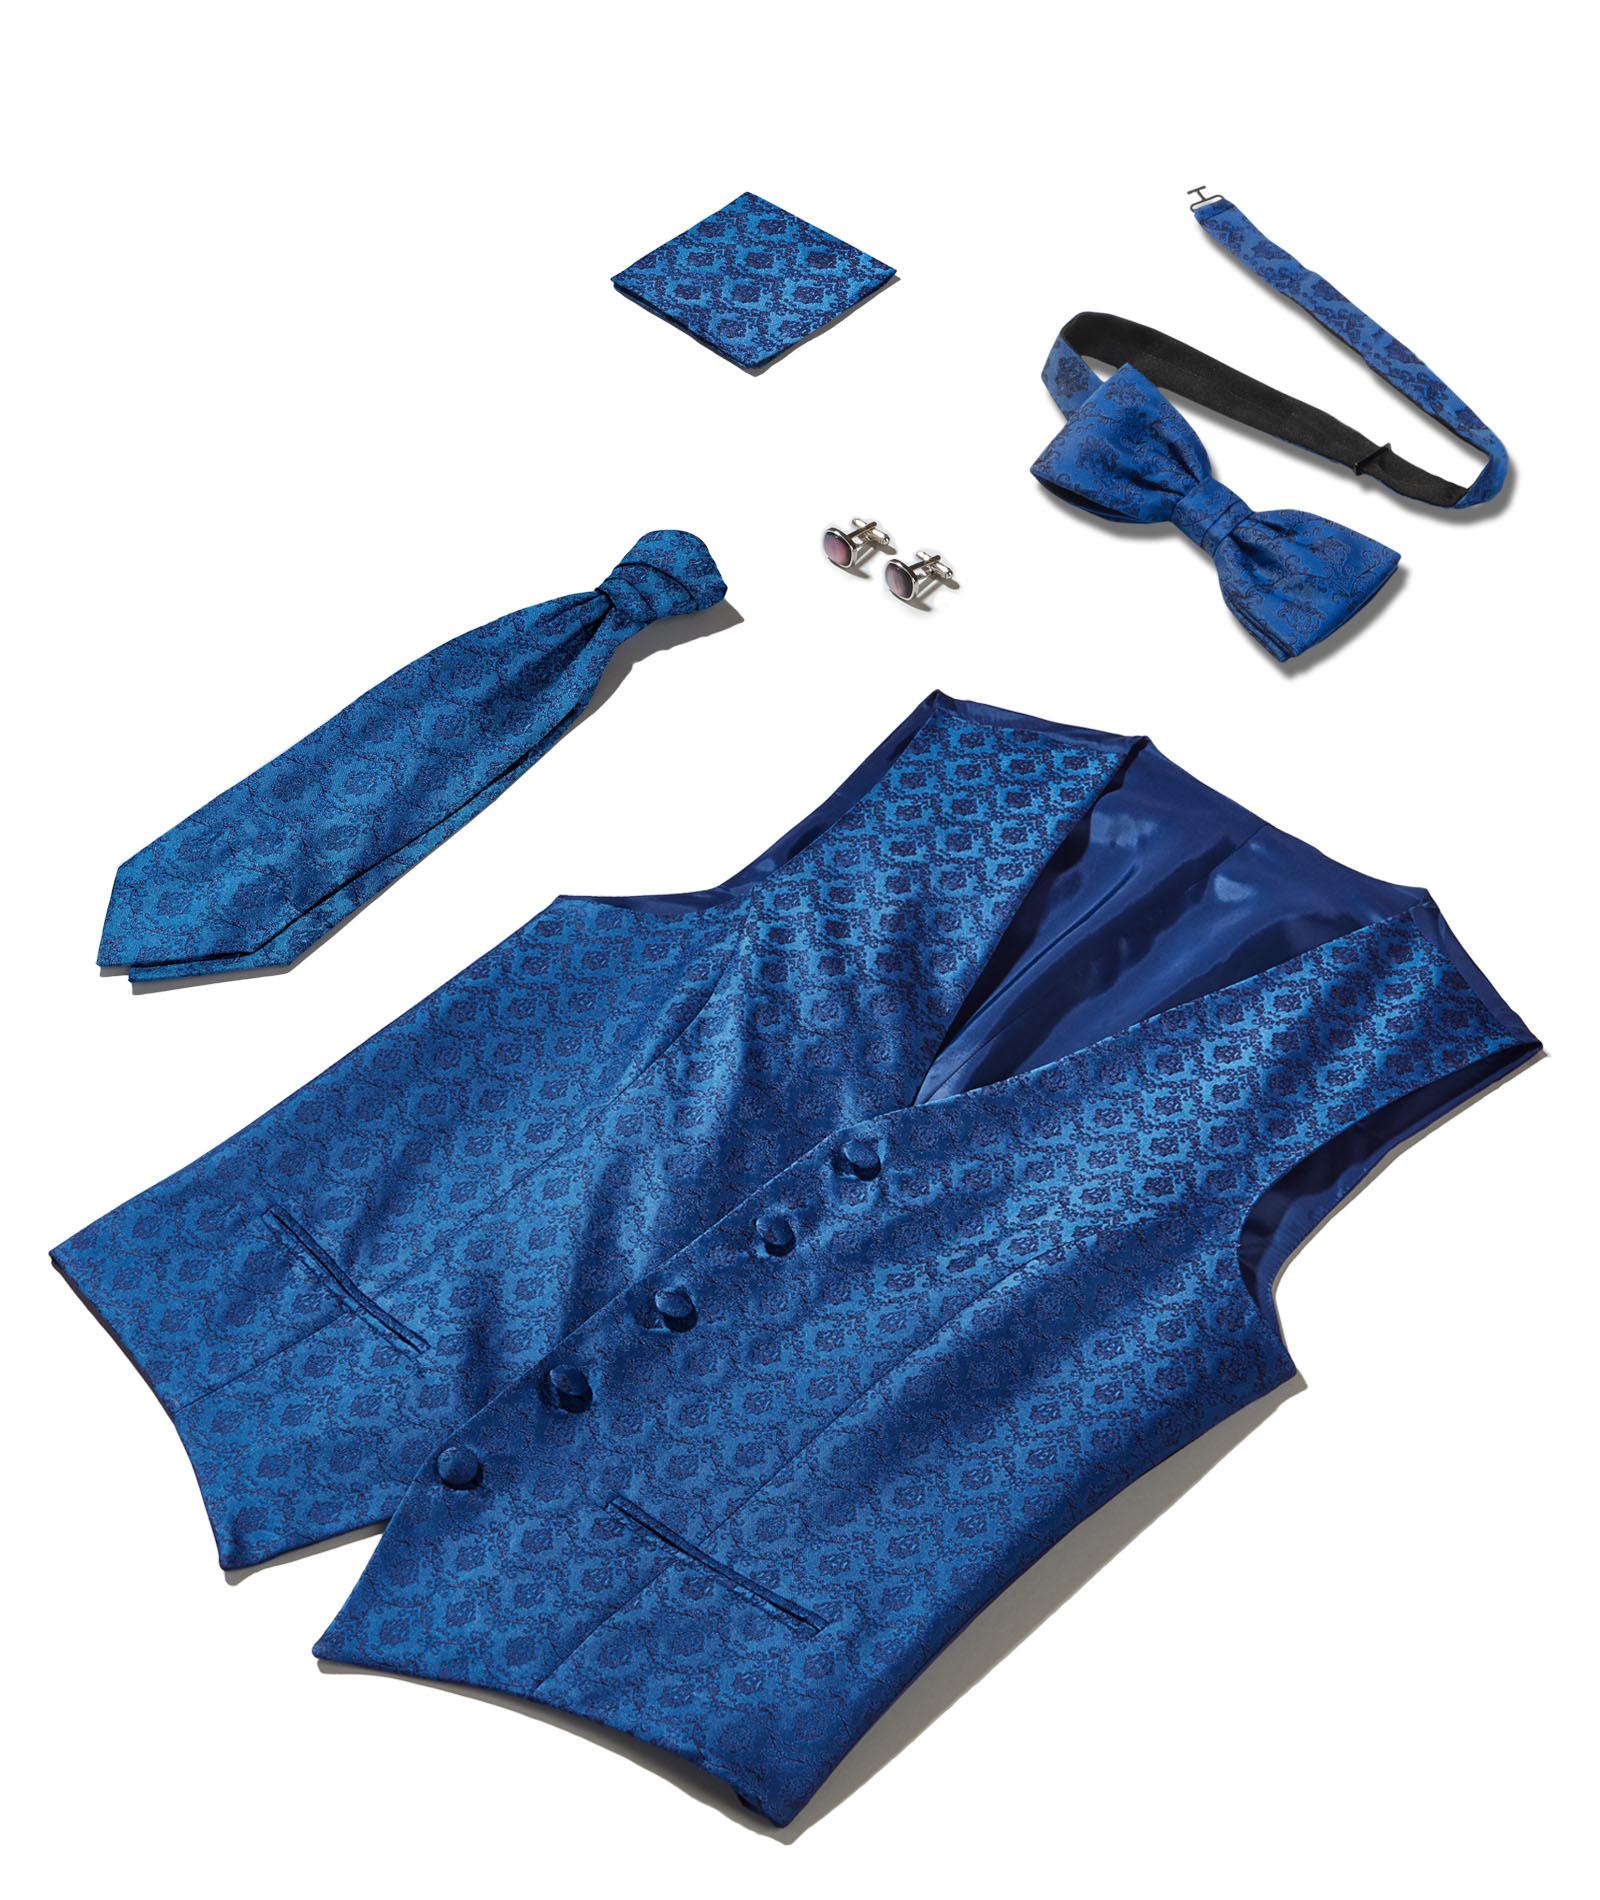 Blaue Barockmusterung